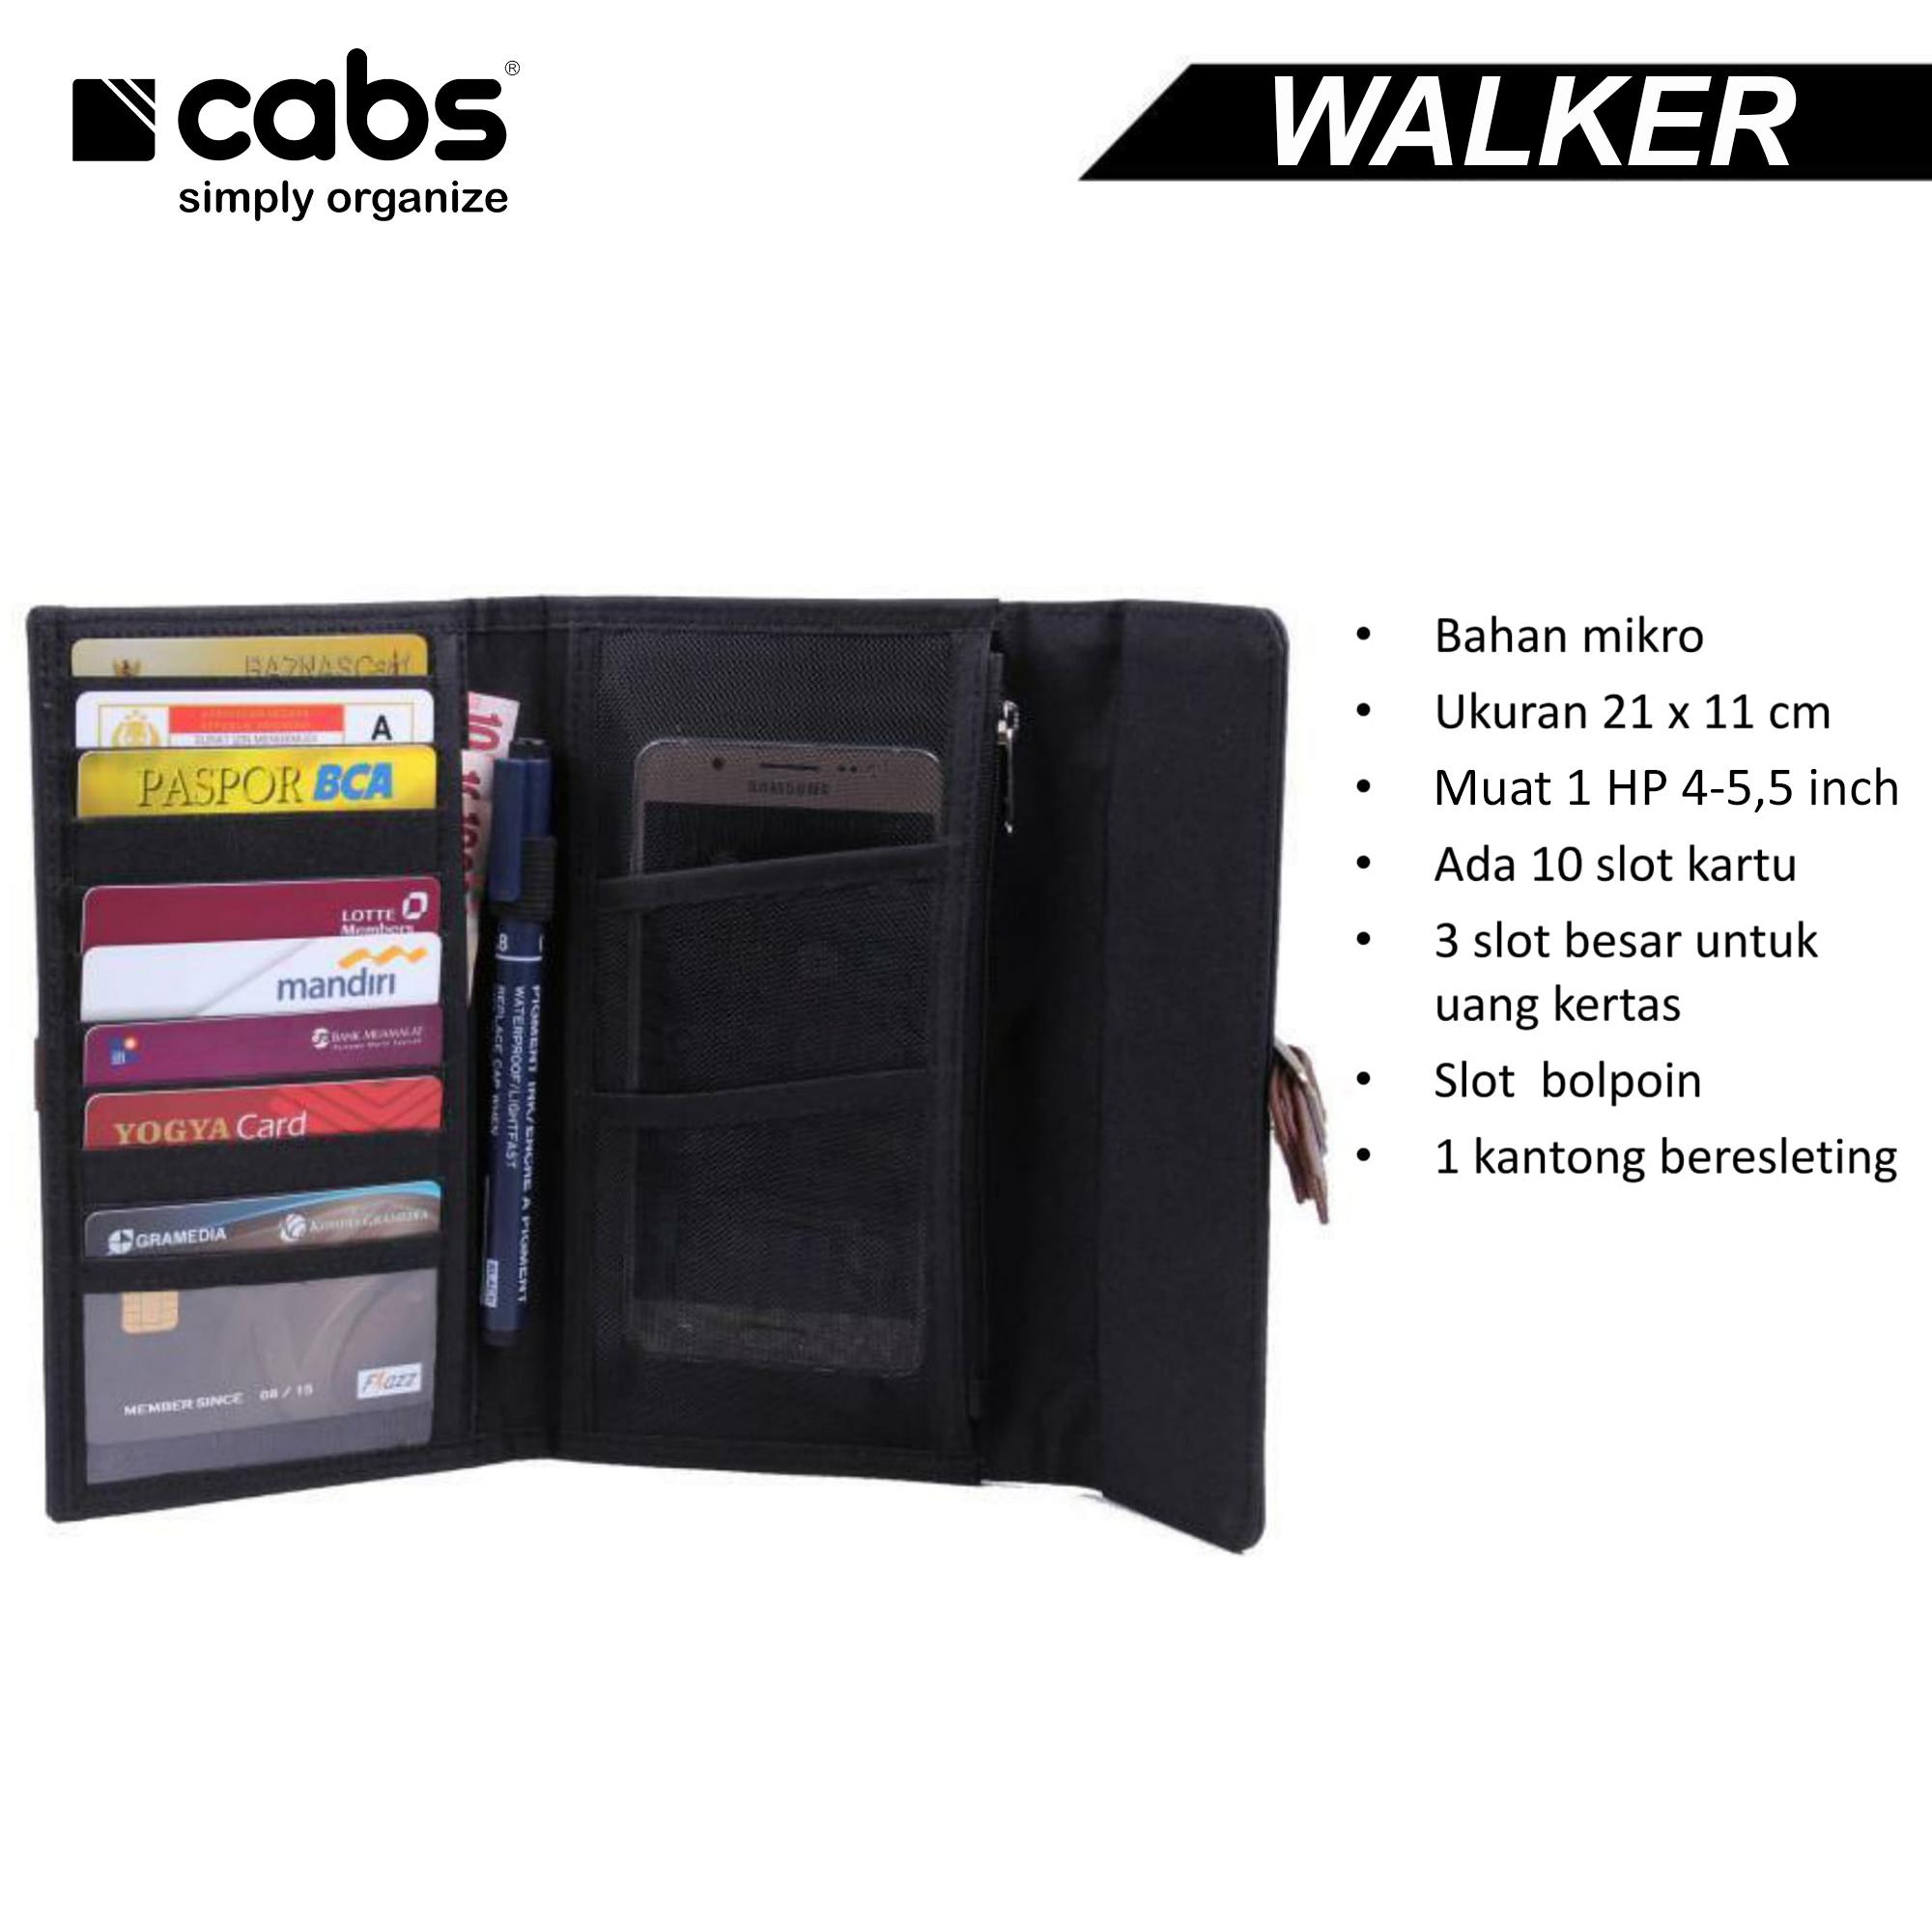 ... Cabs Pocket Walker Dompet Pria   Wanita Hpo Lokal Organizer Unik Murah  Serbaguna Dompet Kartu Anti ... c87cf8a6de